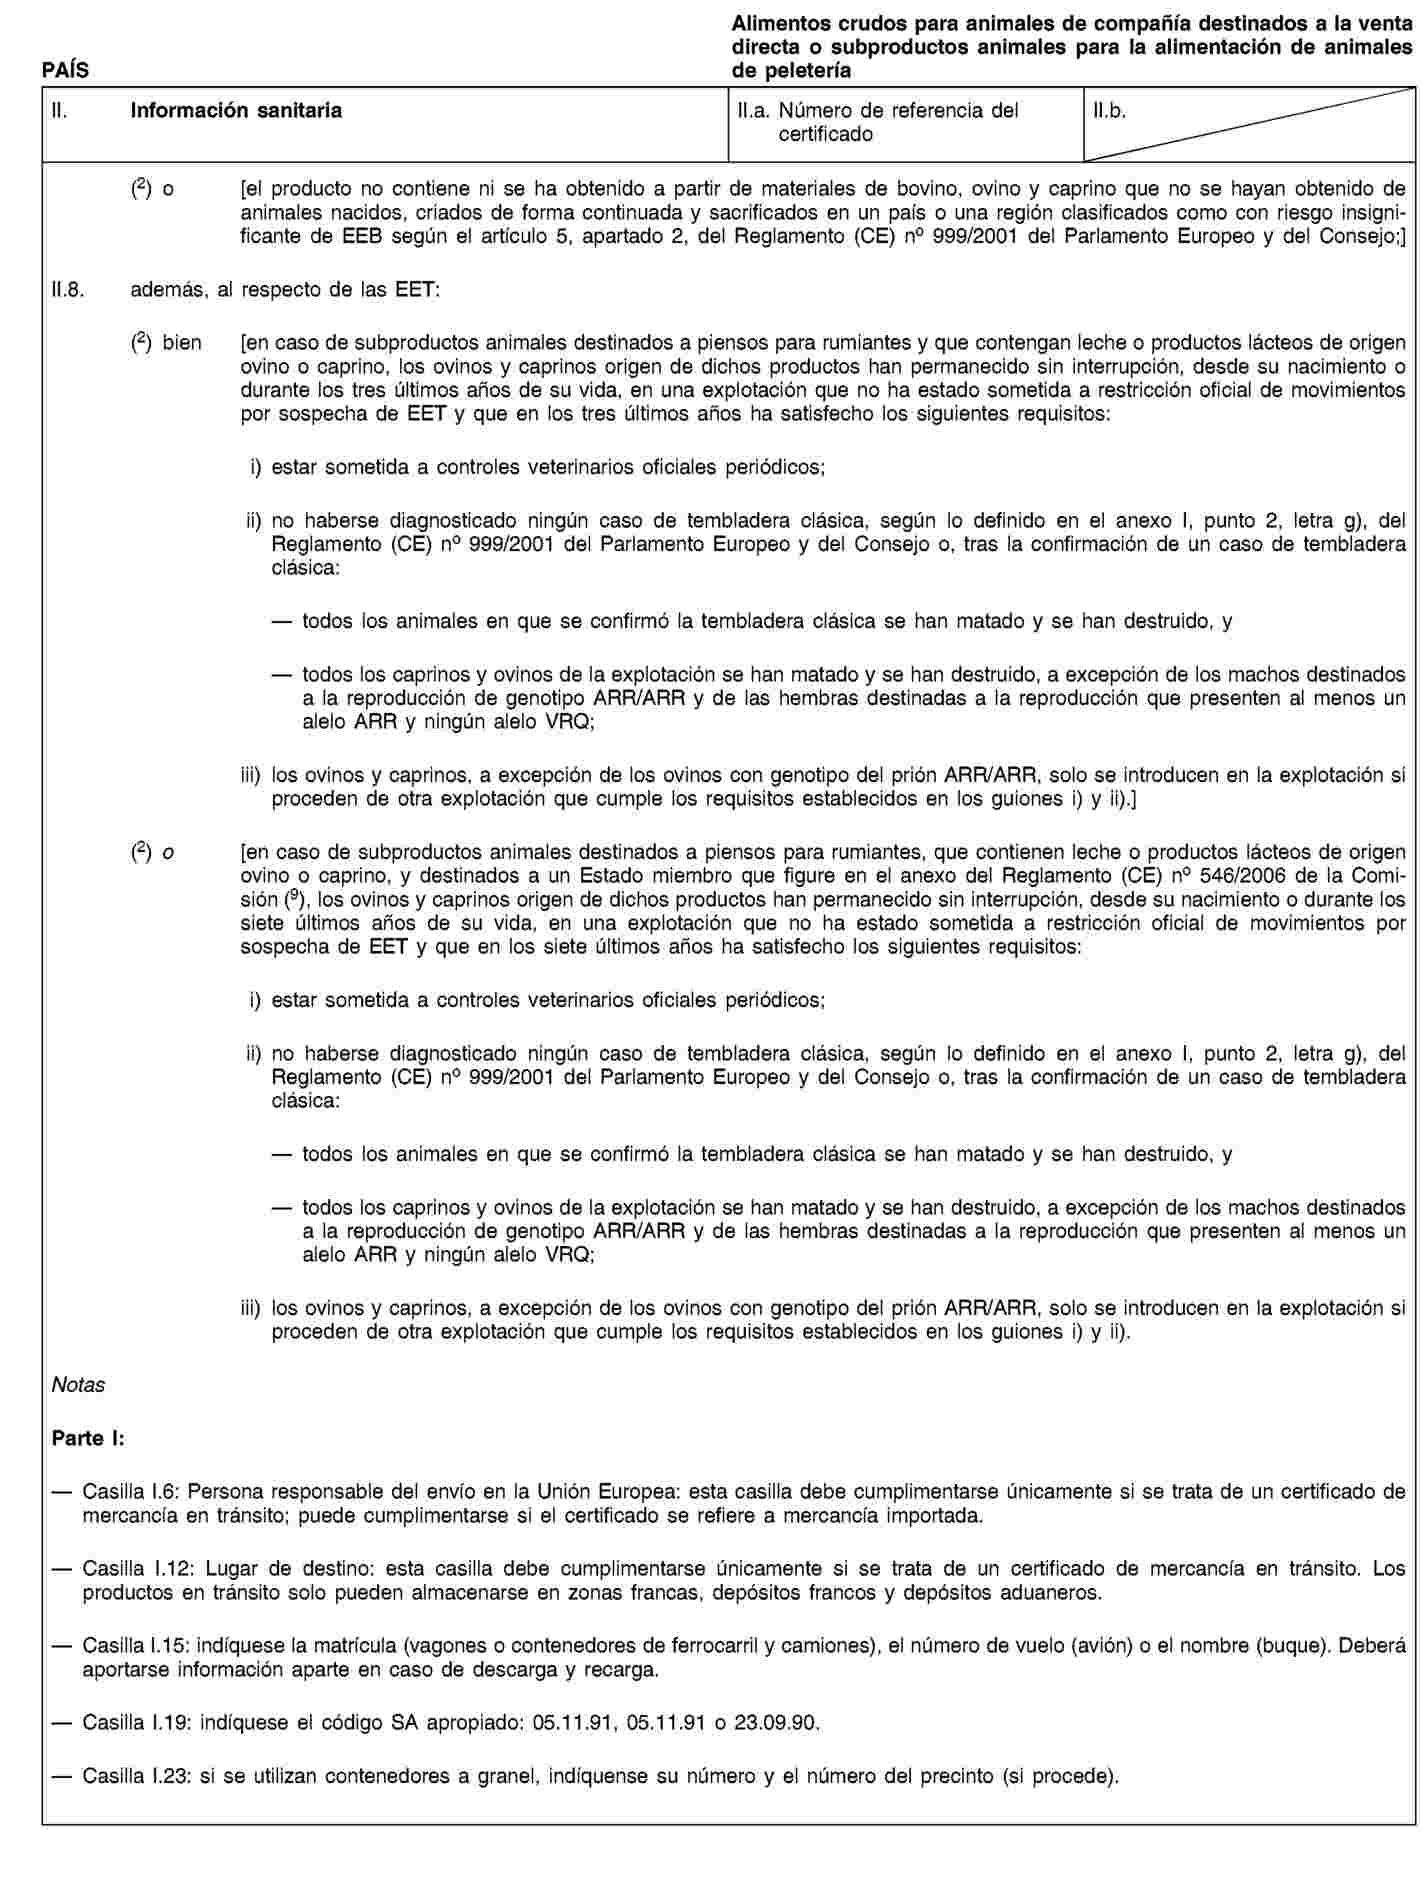 Imagen: https://eur-lex.europa.eu/resource.html?uri=uriserv:OJ.L_.2011.054.01.0001.01.SPA.xhtml.L_2011054ES.01014801.tif.jpg